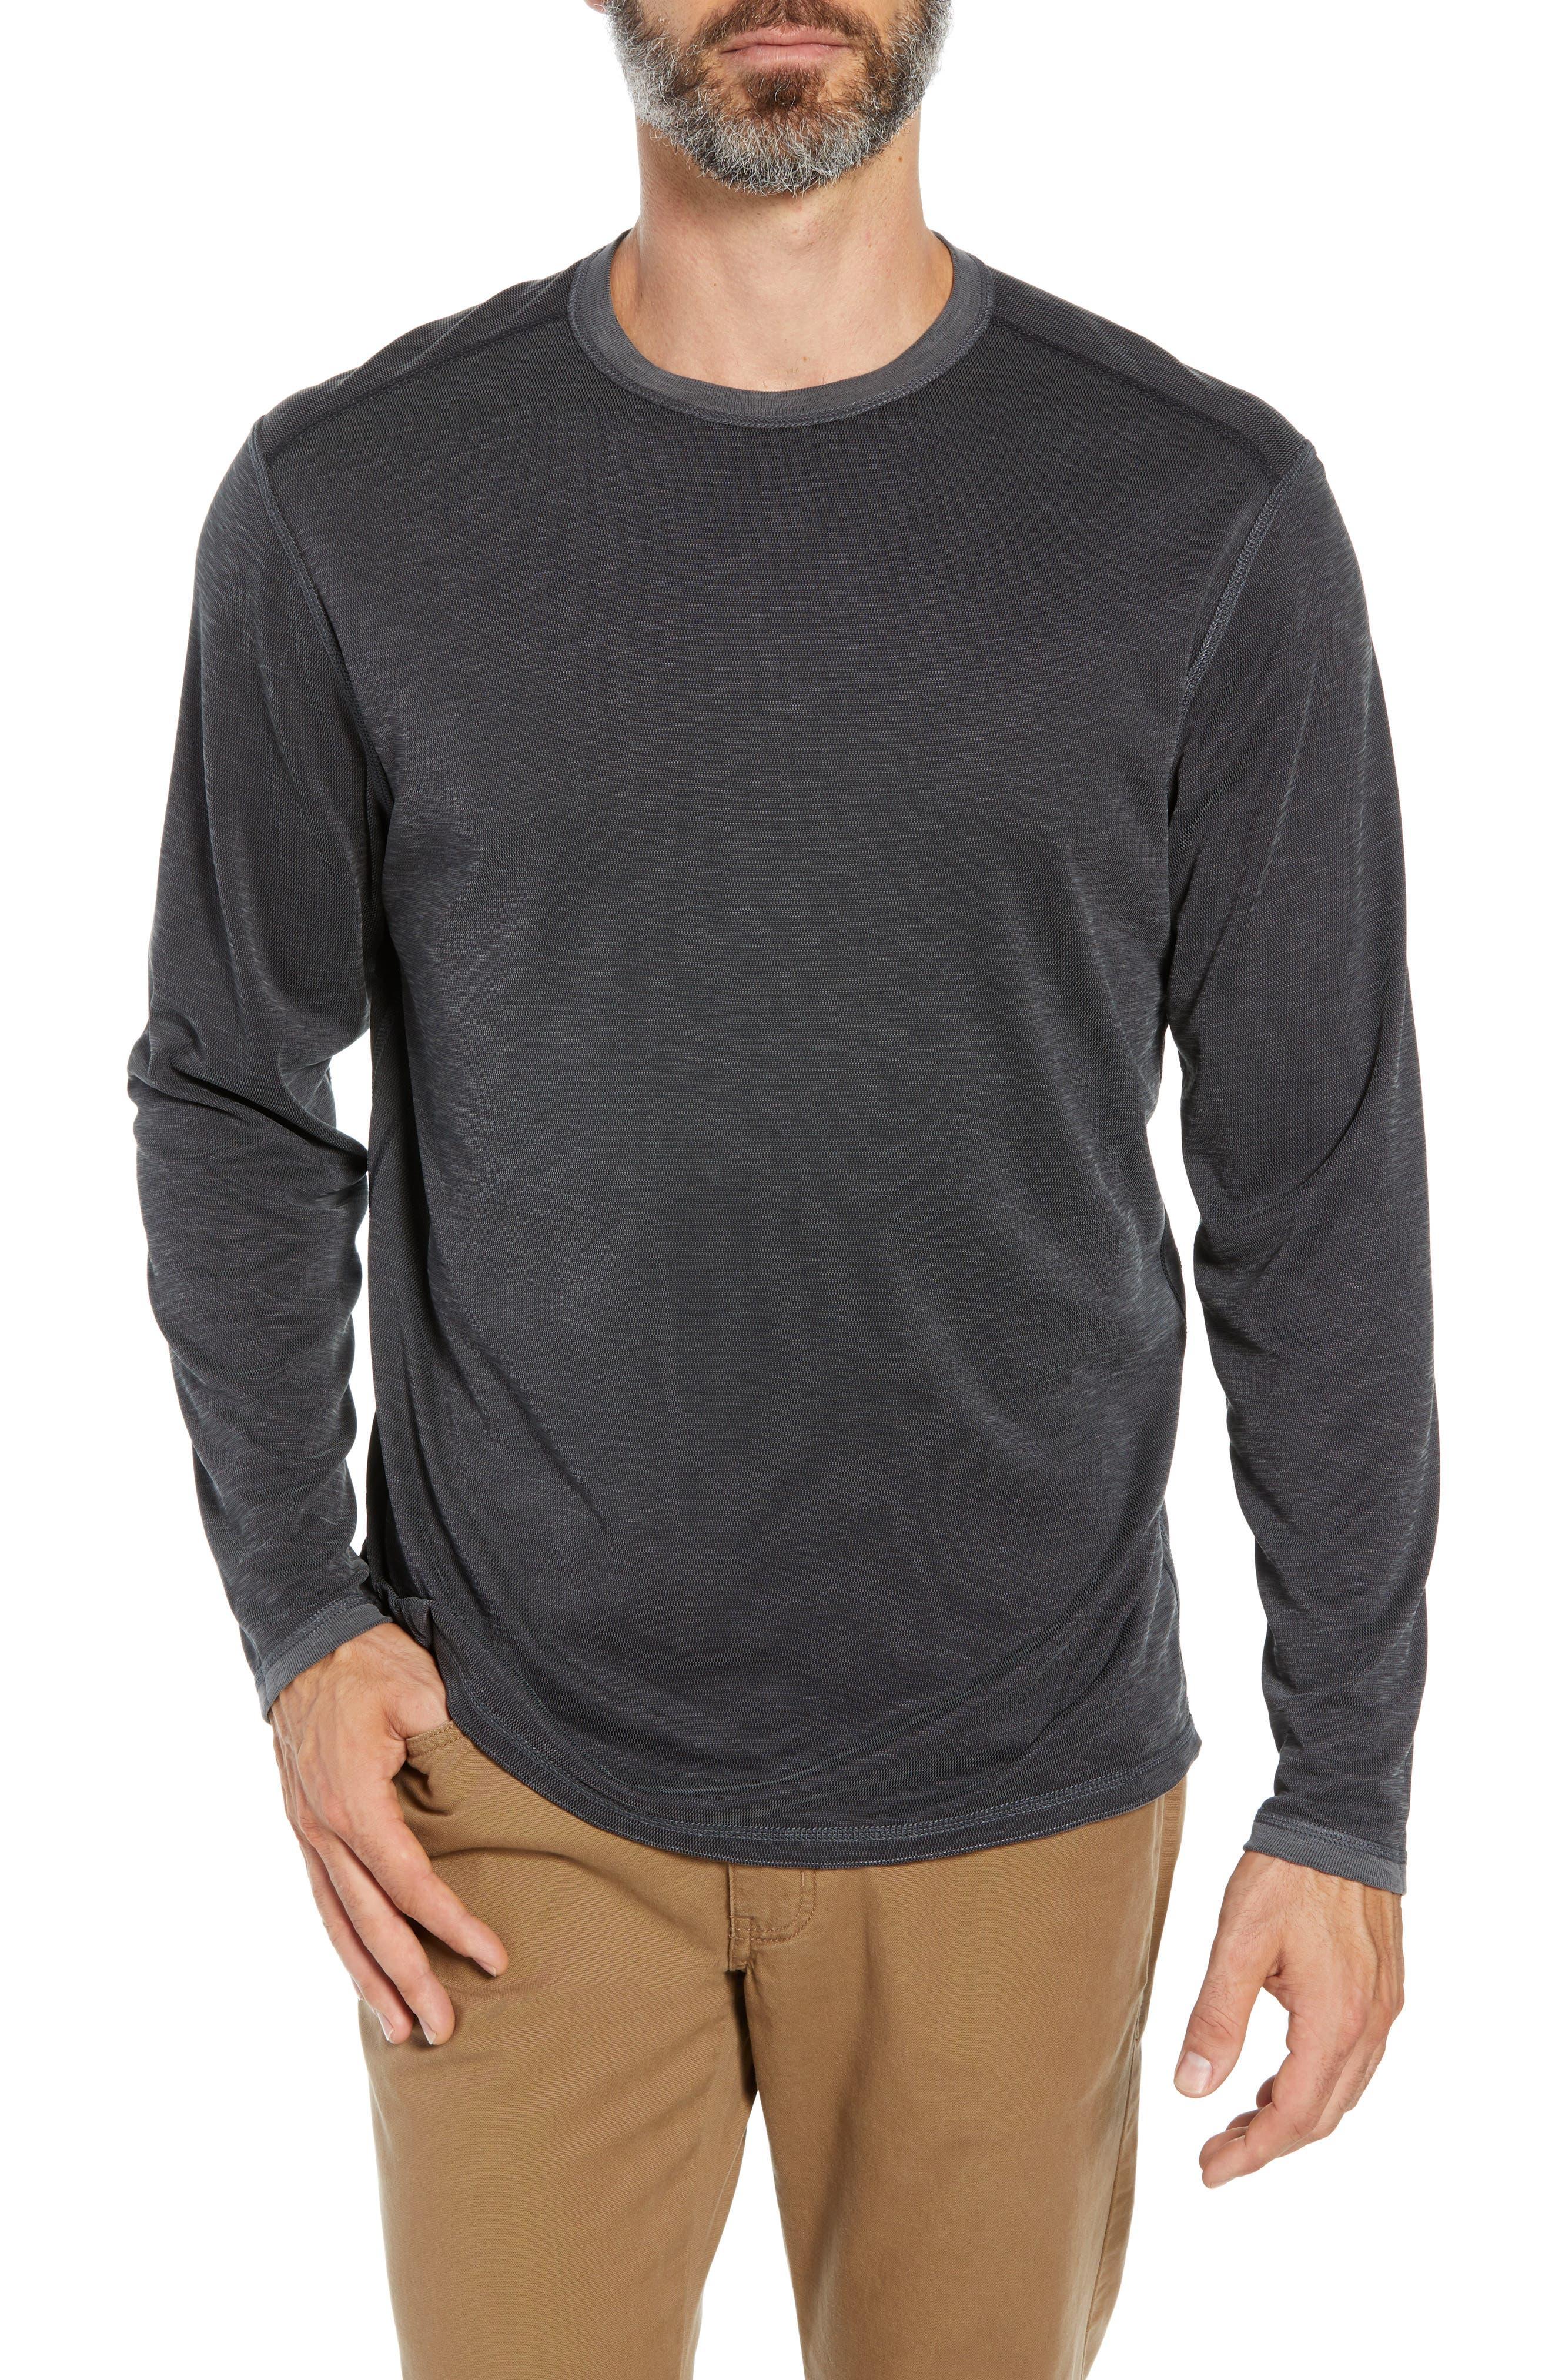 TOMMY BAHAMA, Flip Tide T-shirt, Alternate thumbnail 2, color, BLACK